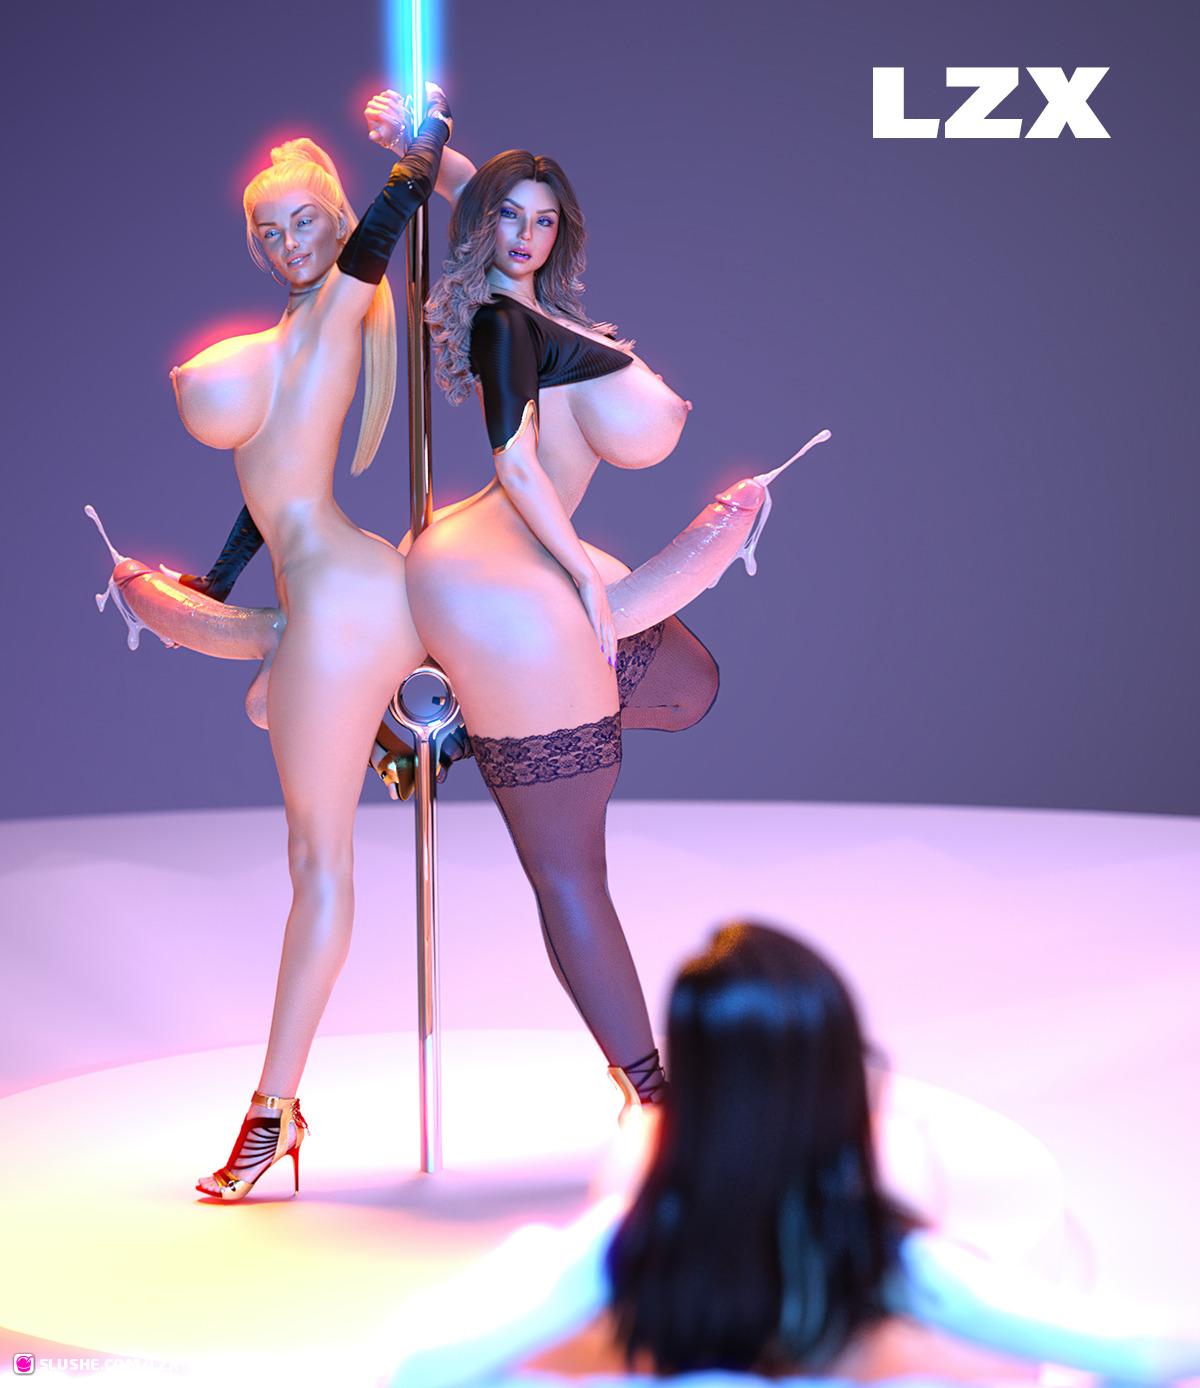 Elizabeth, April & Cassandra - Her pleasure